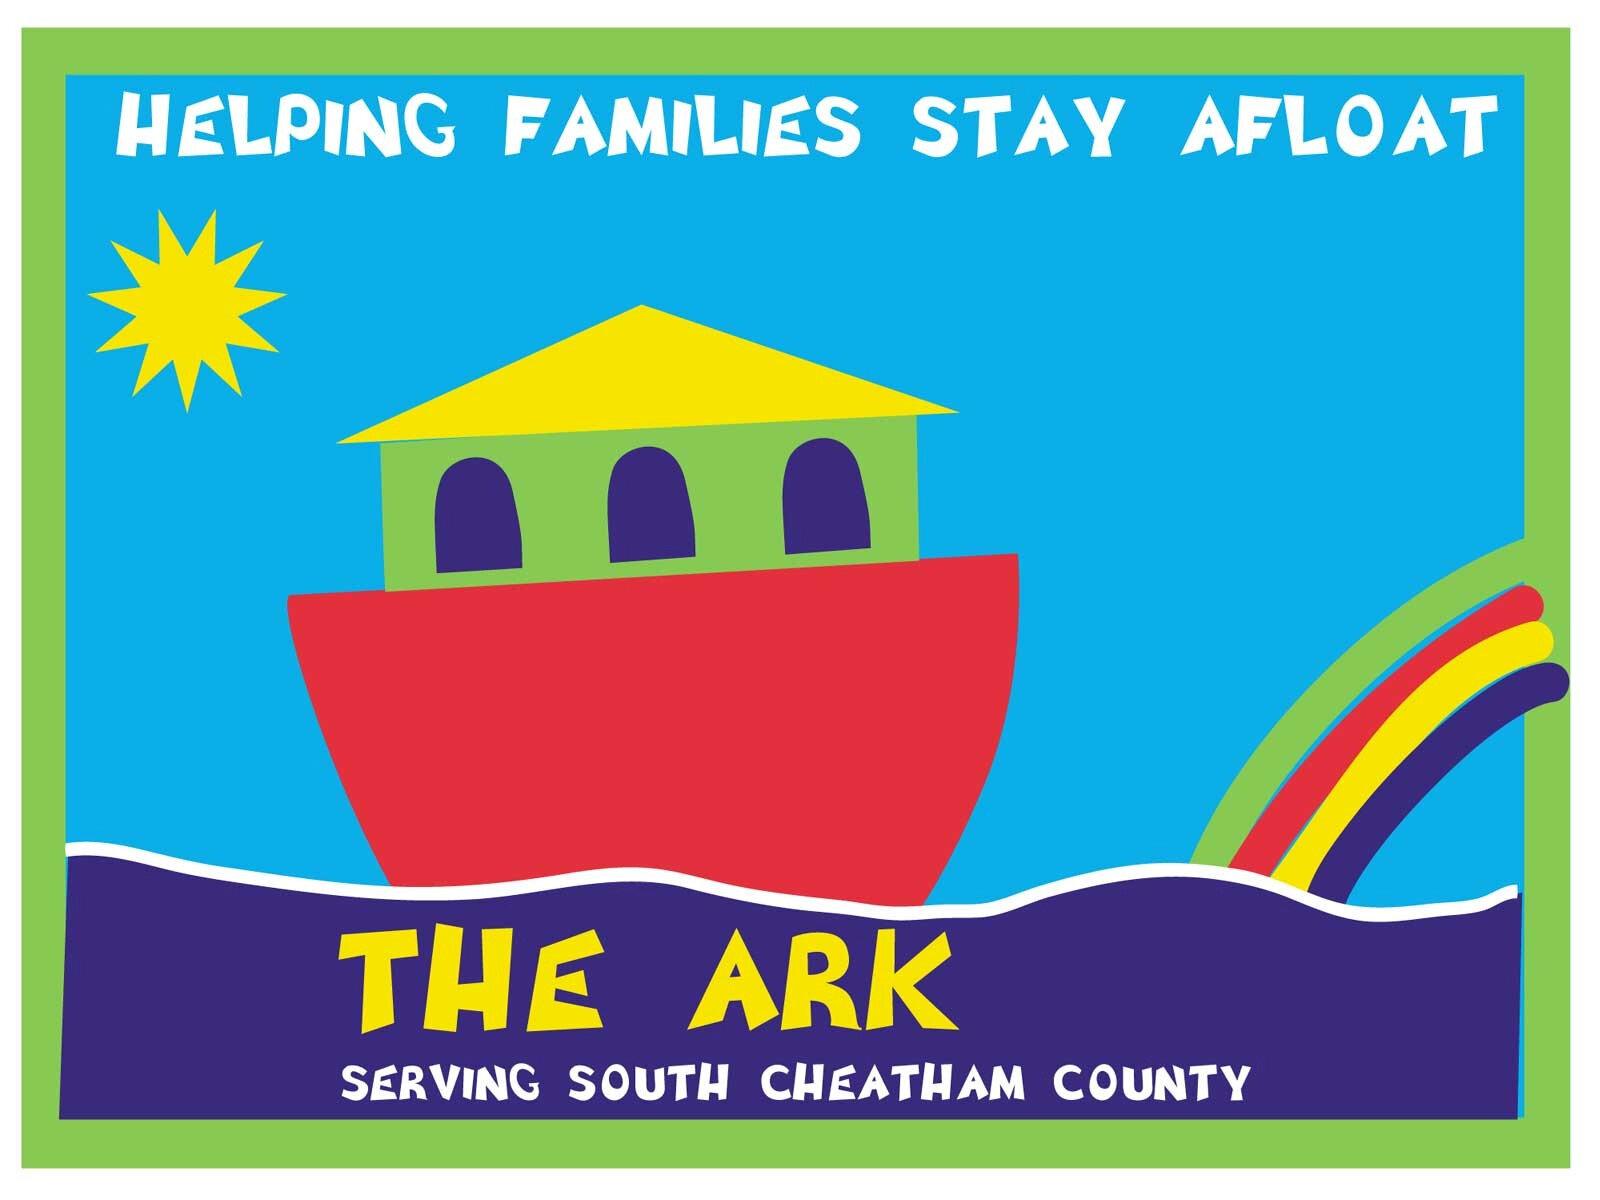 ark-logo-copy.jpg